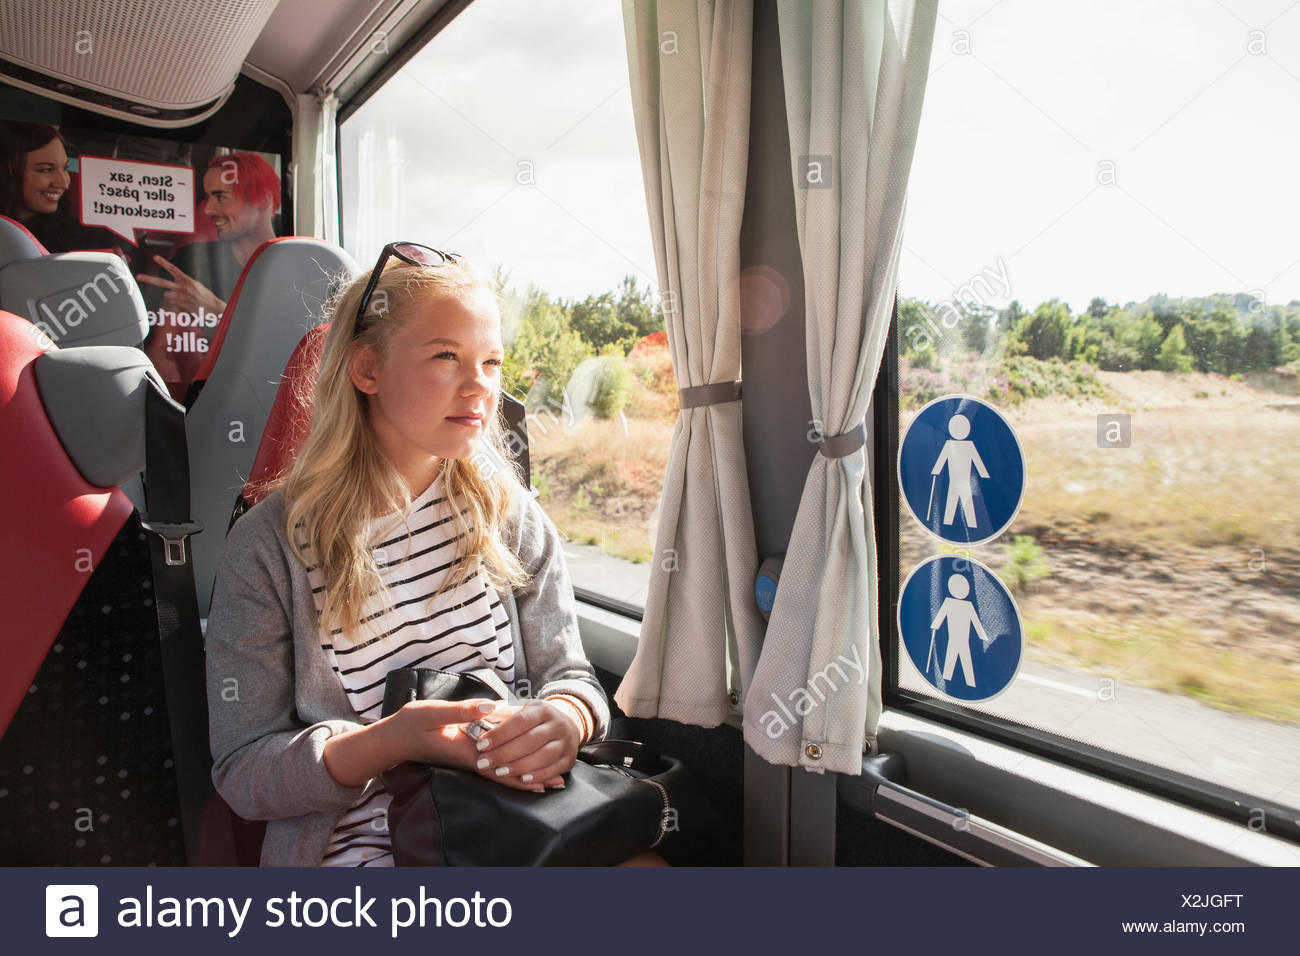 Teenage girl sitting on train - Stock Image